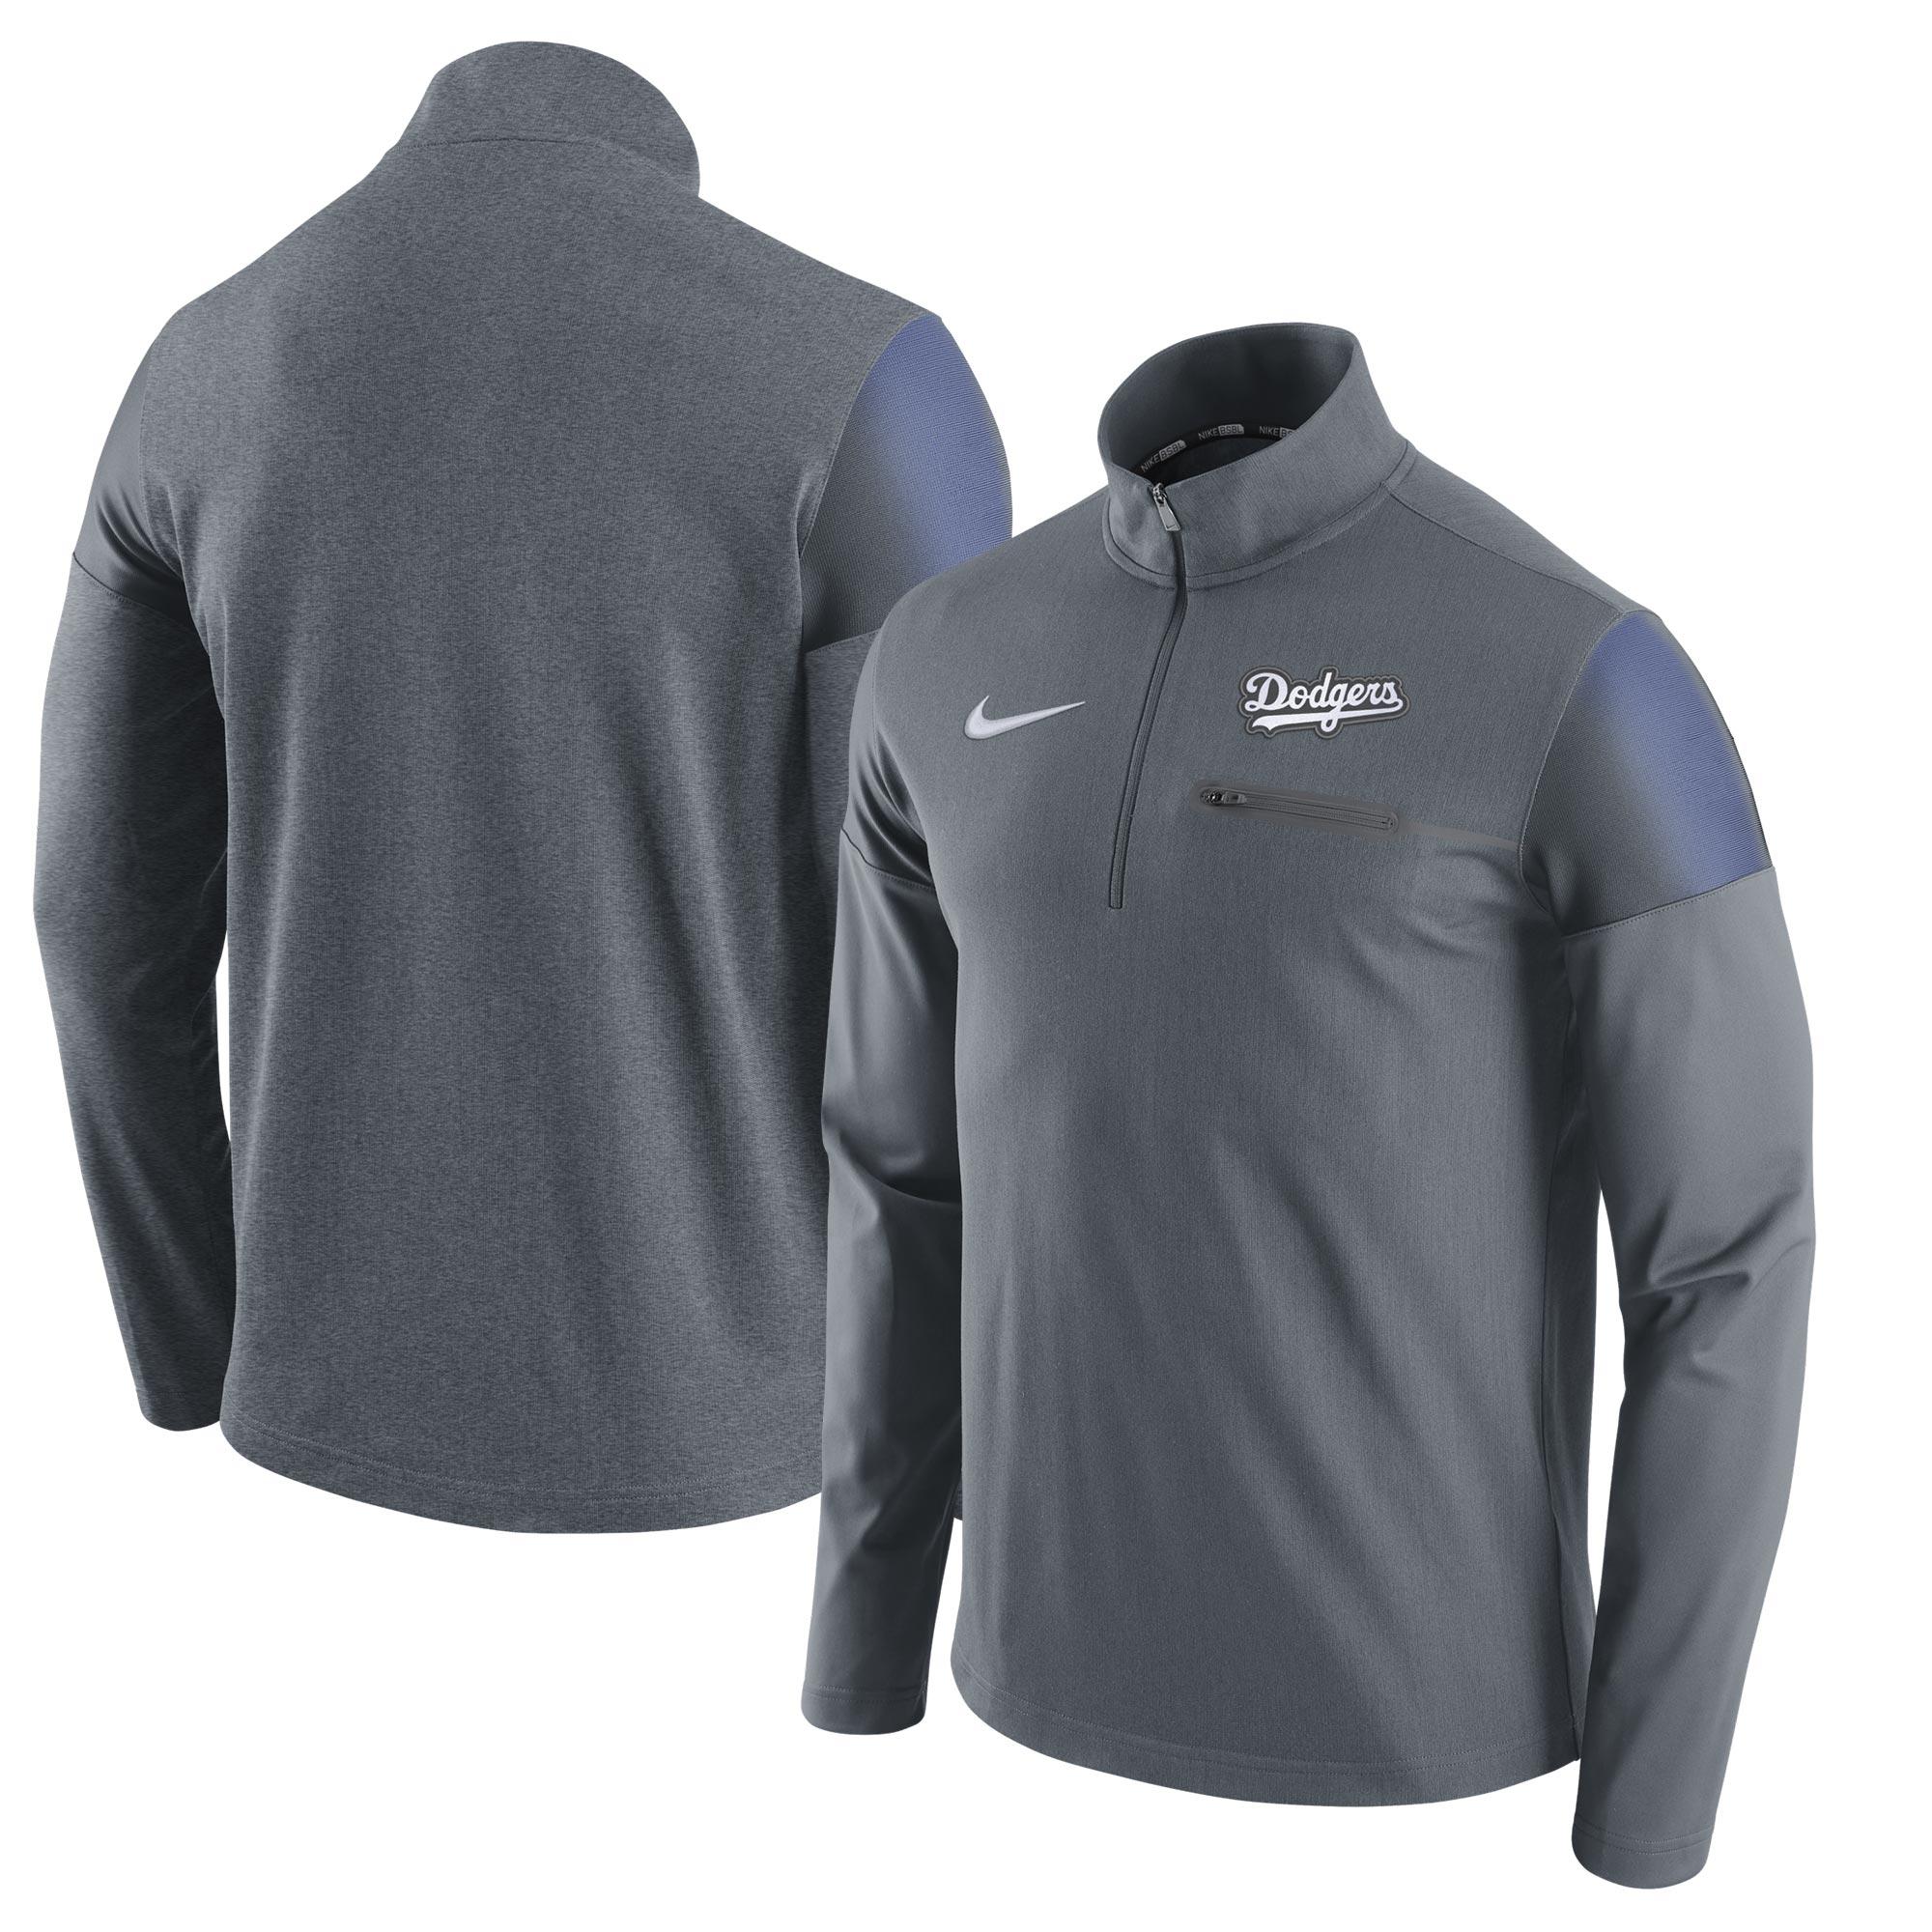 Los Angeles Dodgers Nike Elite Half-Zip Pullover Jacket - Gray